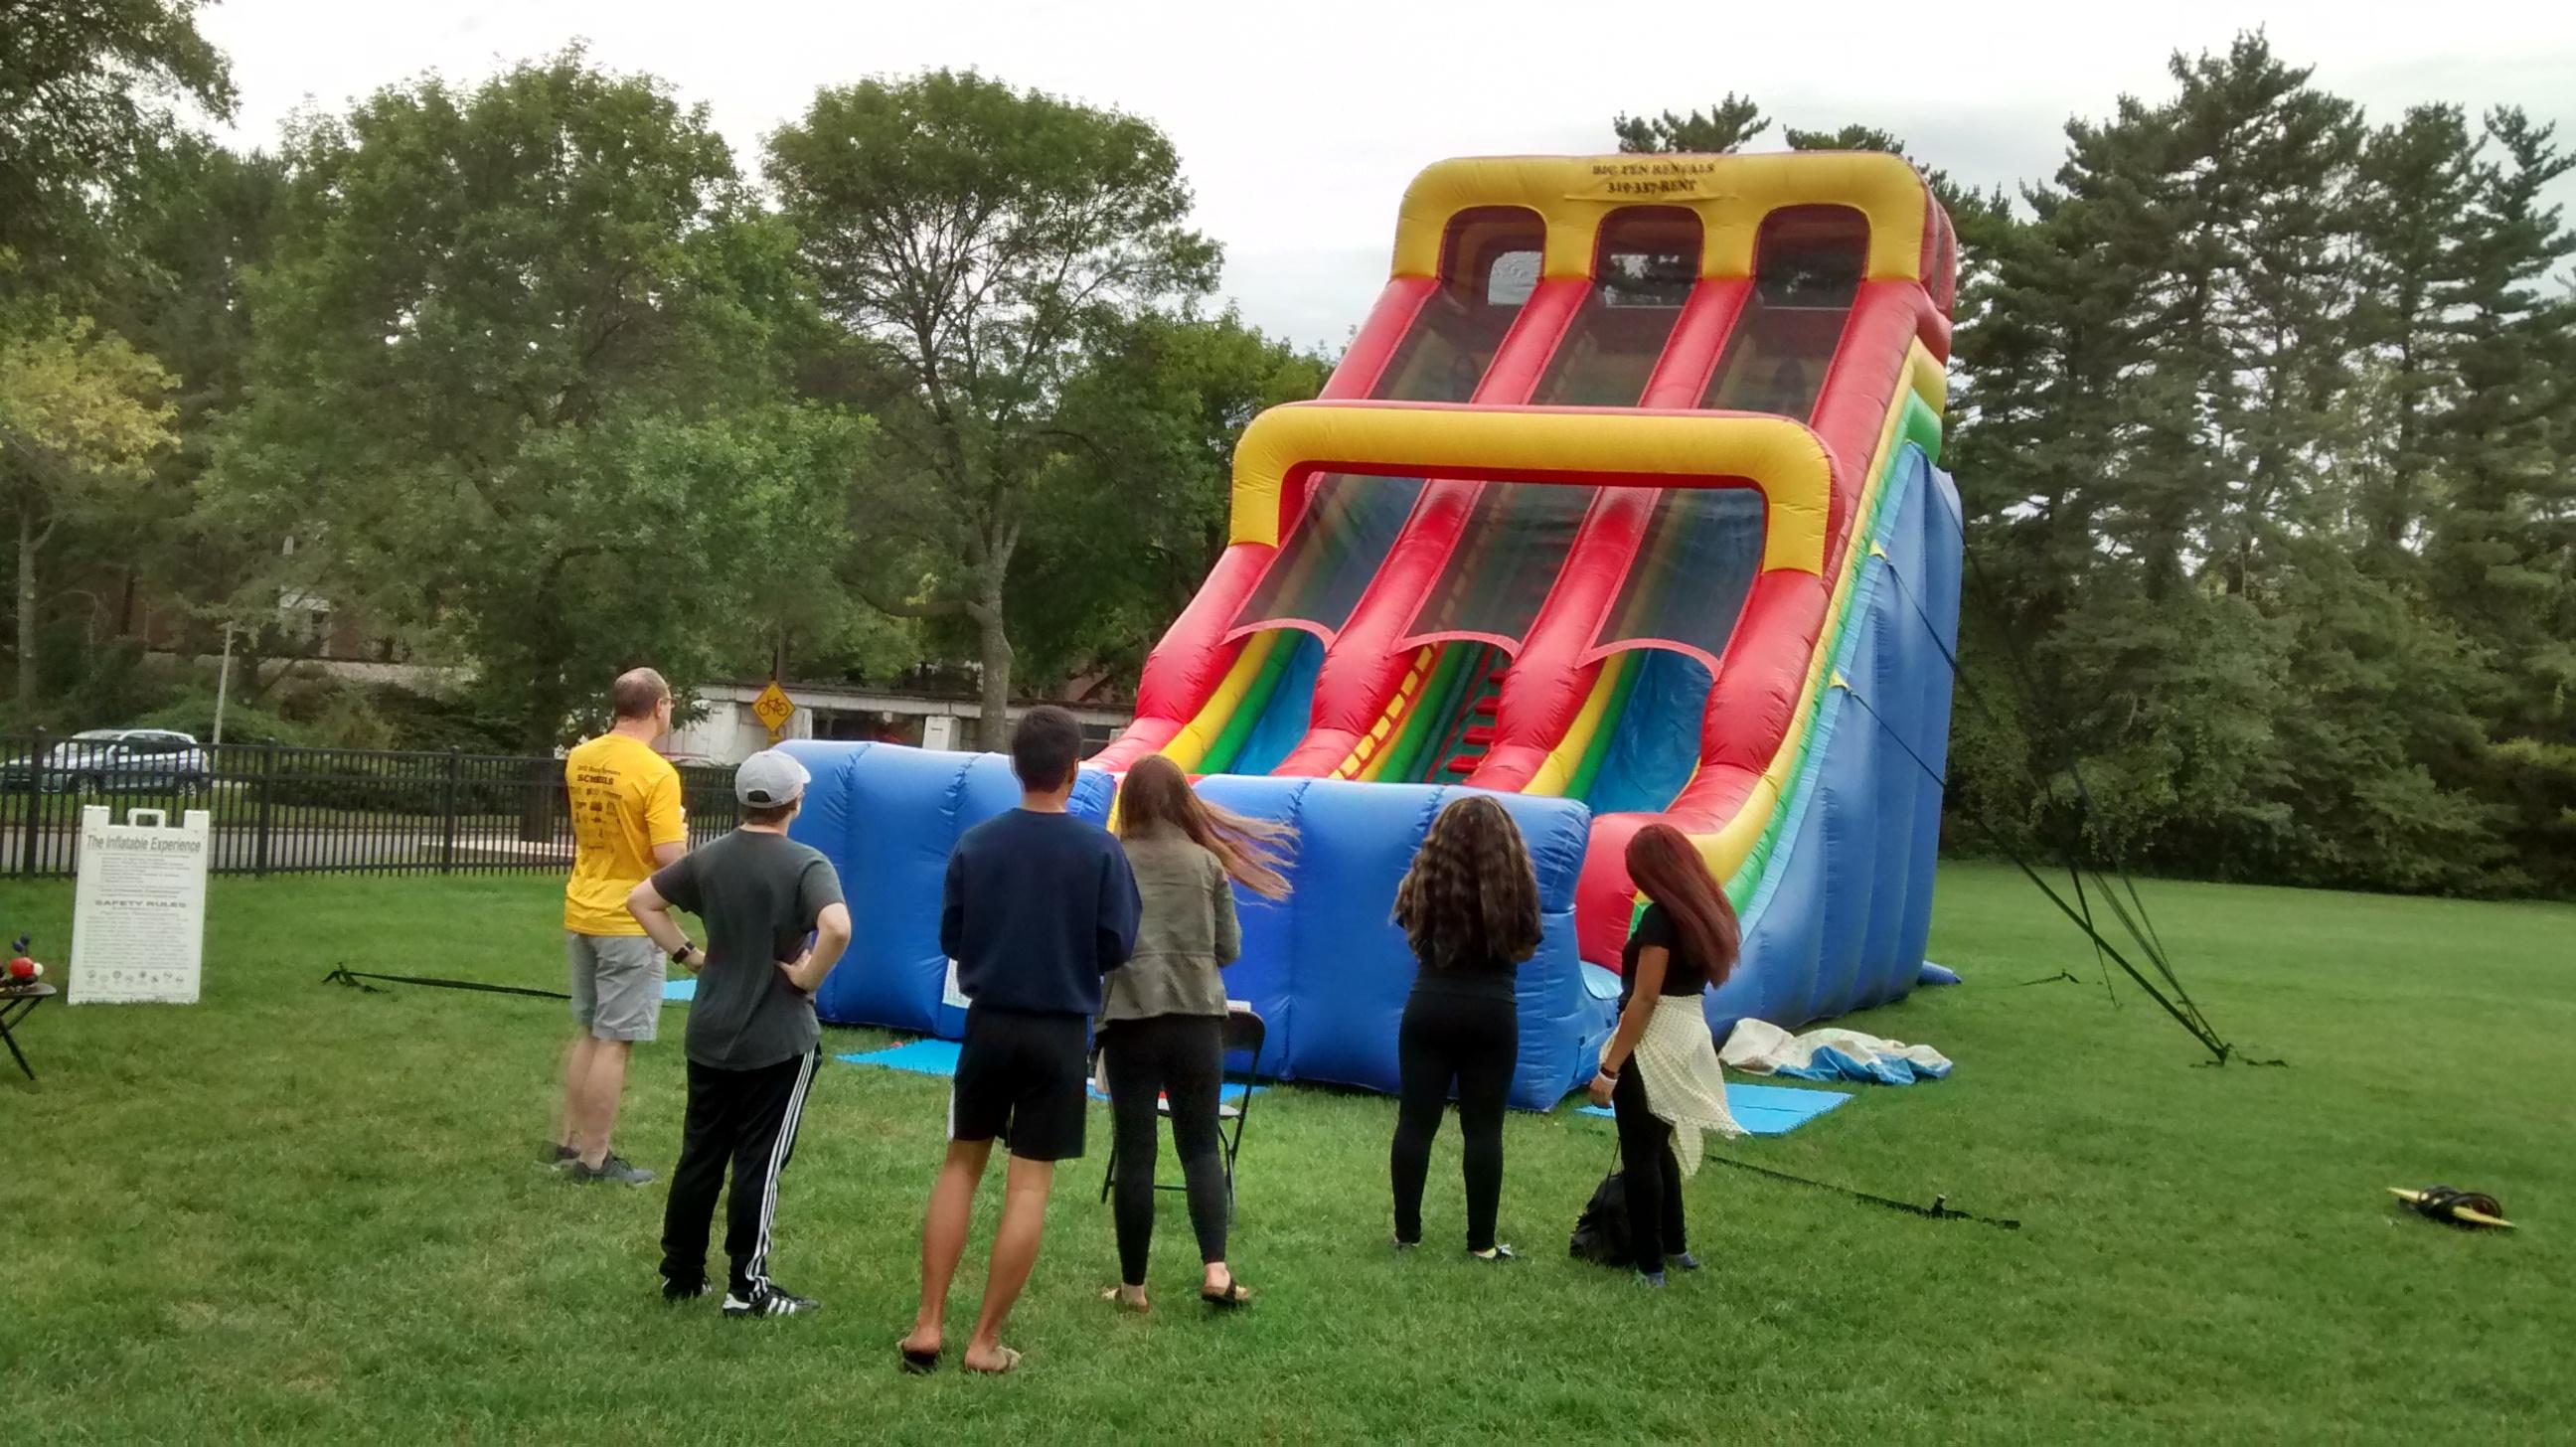 24 Inflatable Slide At University Of Iowa Homecoming Week